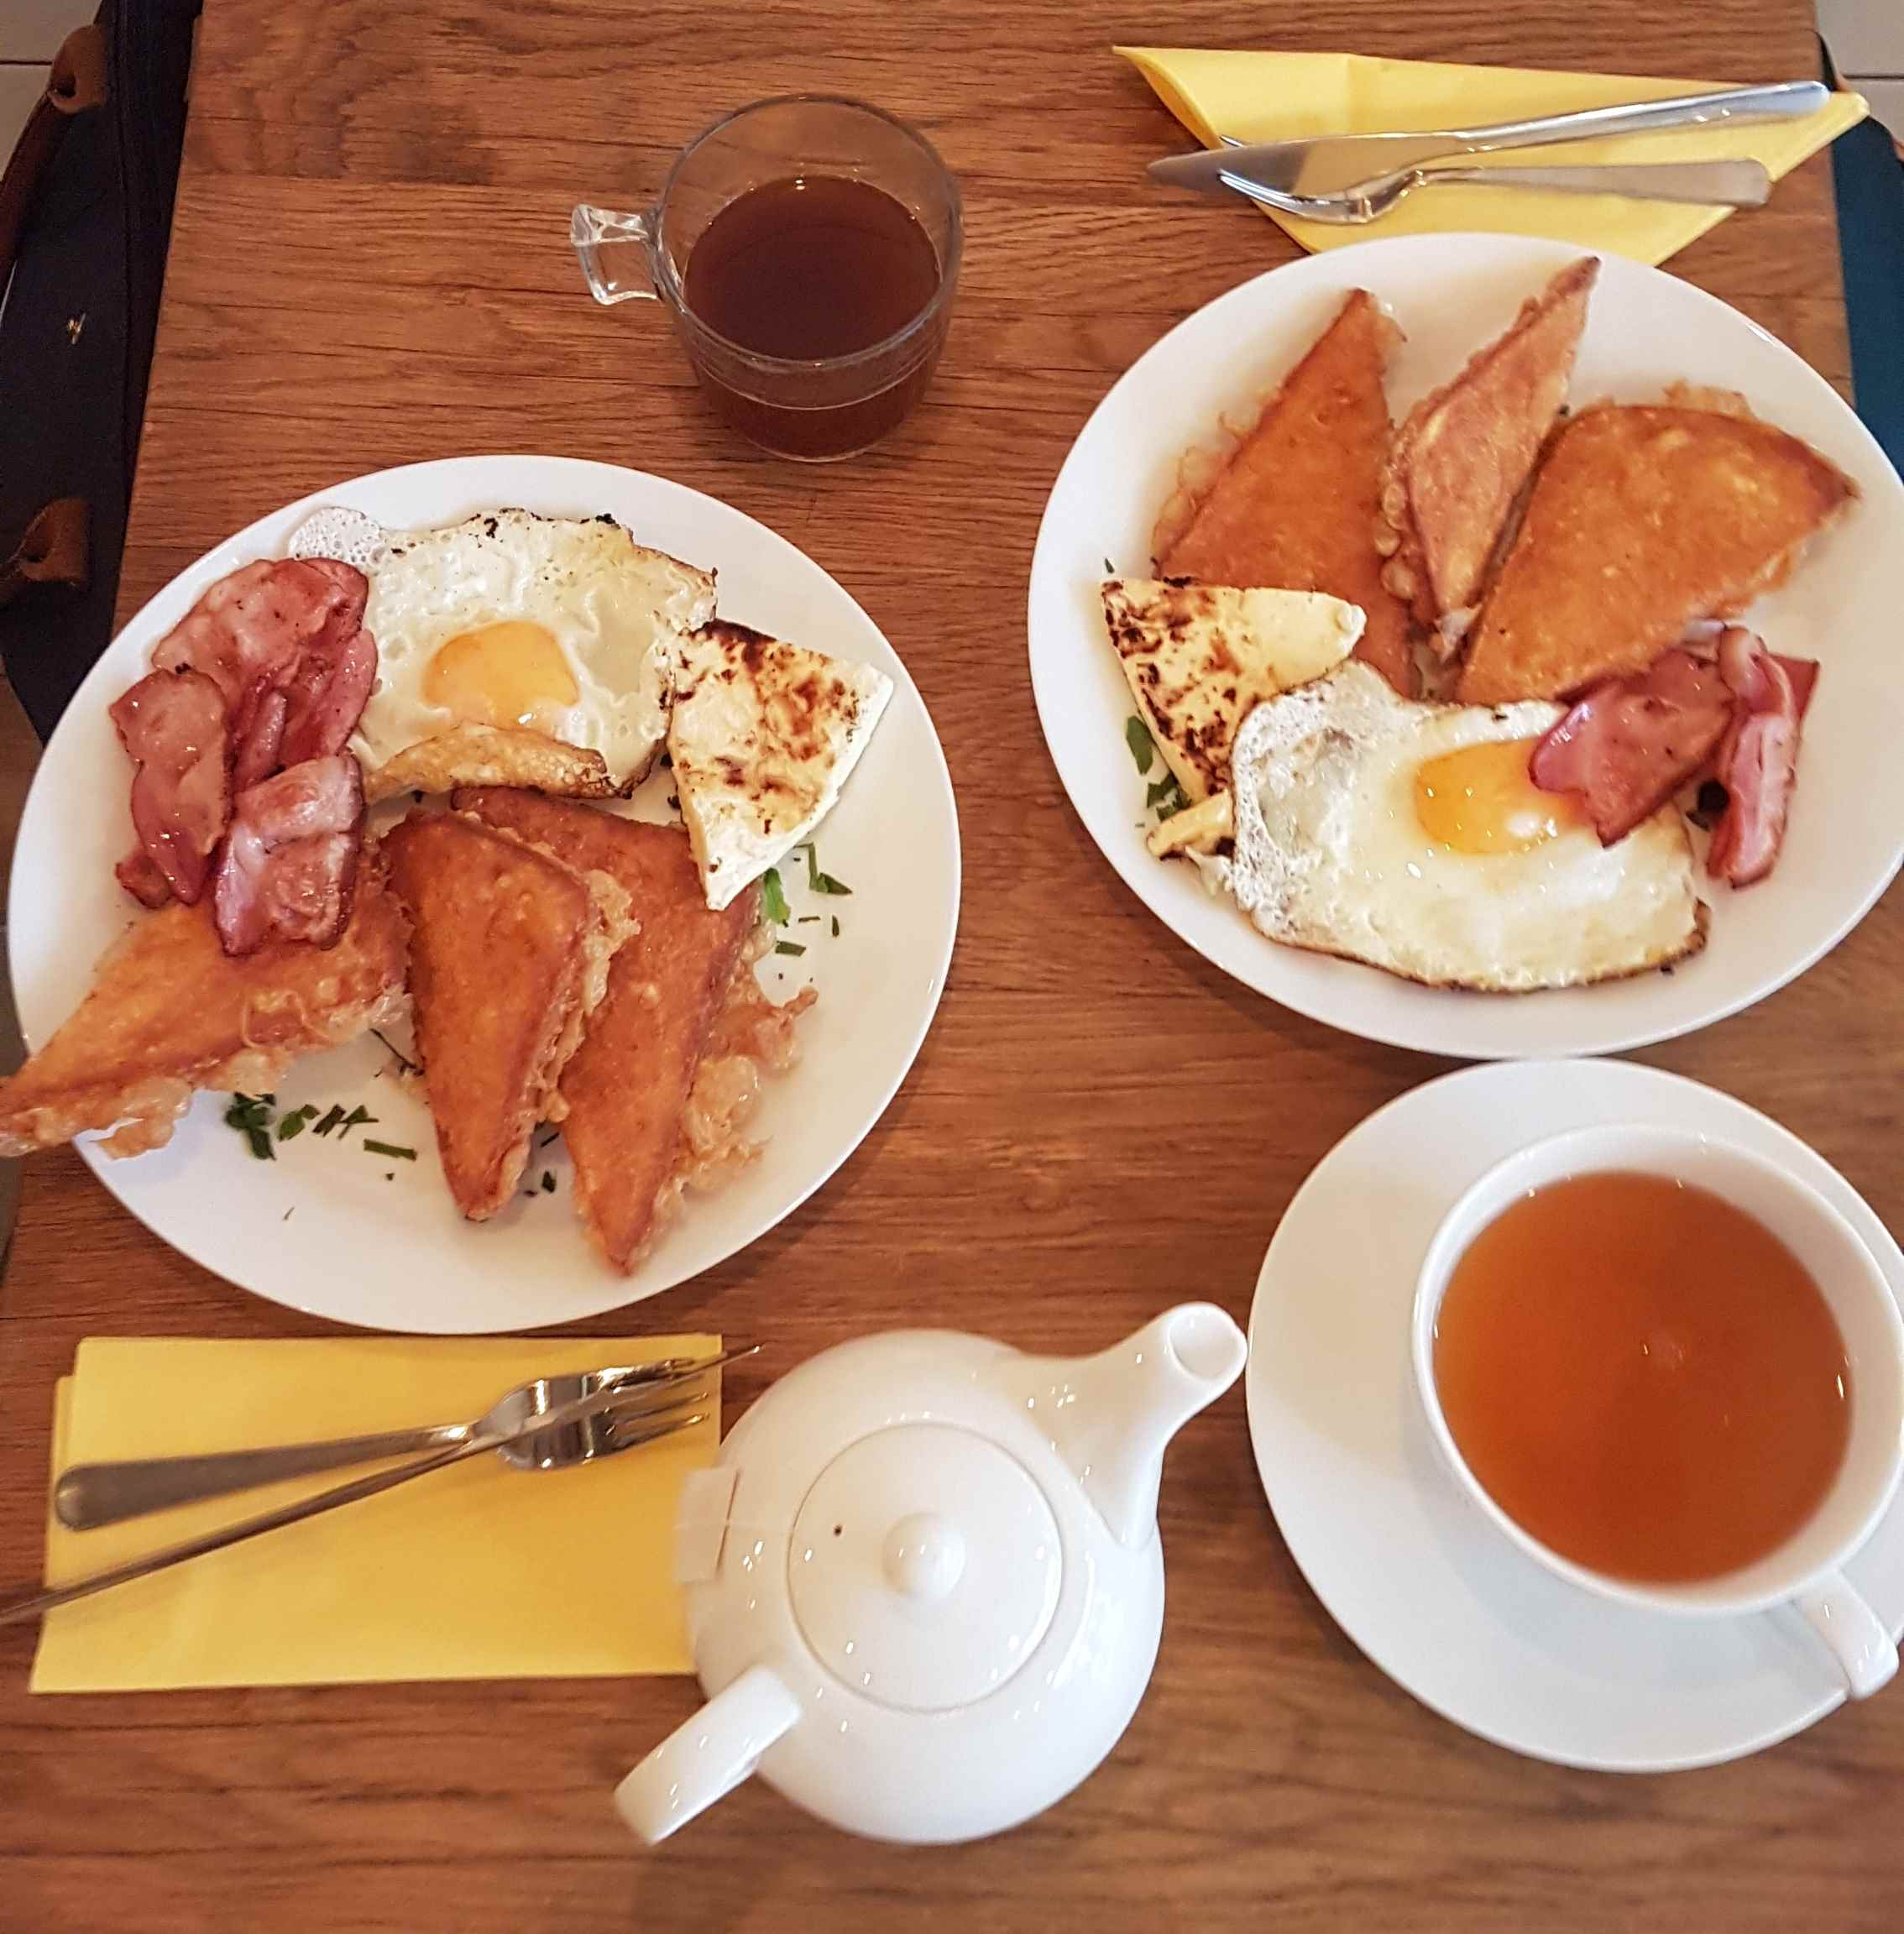 yesempatik-sofya-yeme-icme-mekan-bulgaristan-fabrika-daga-kahvalti-yumurta